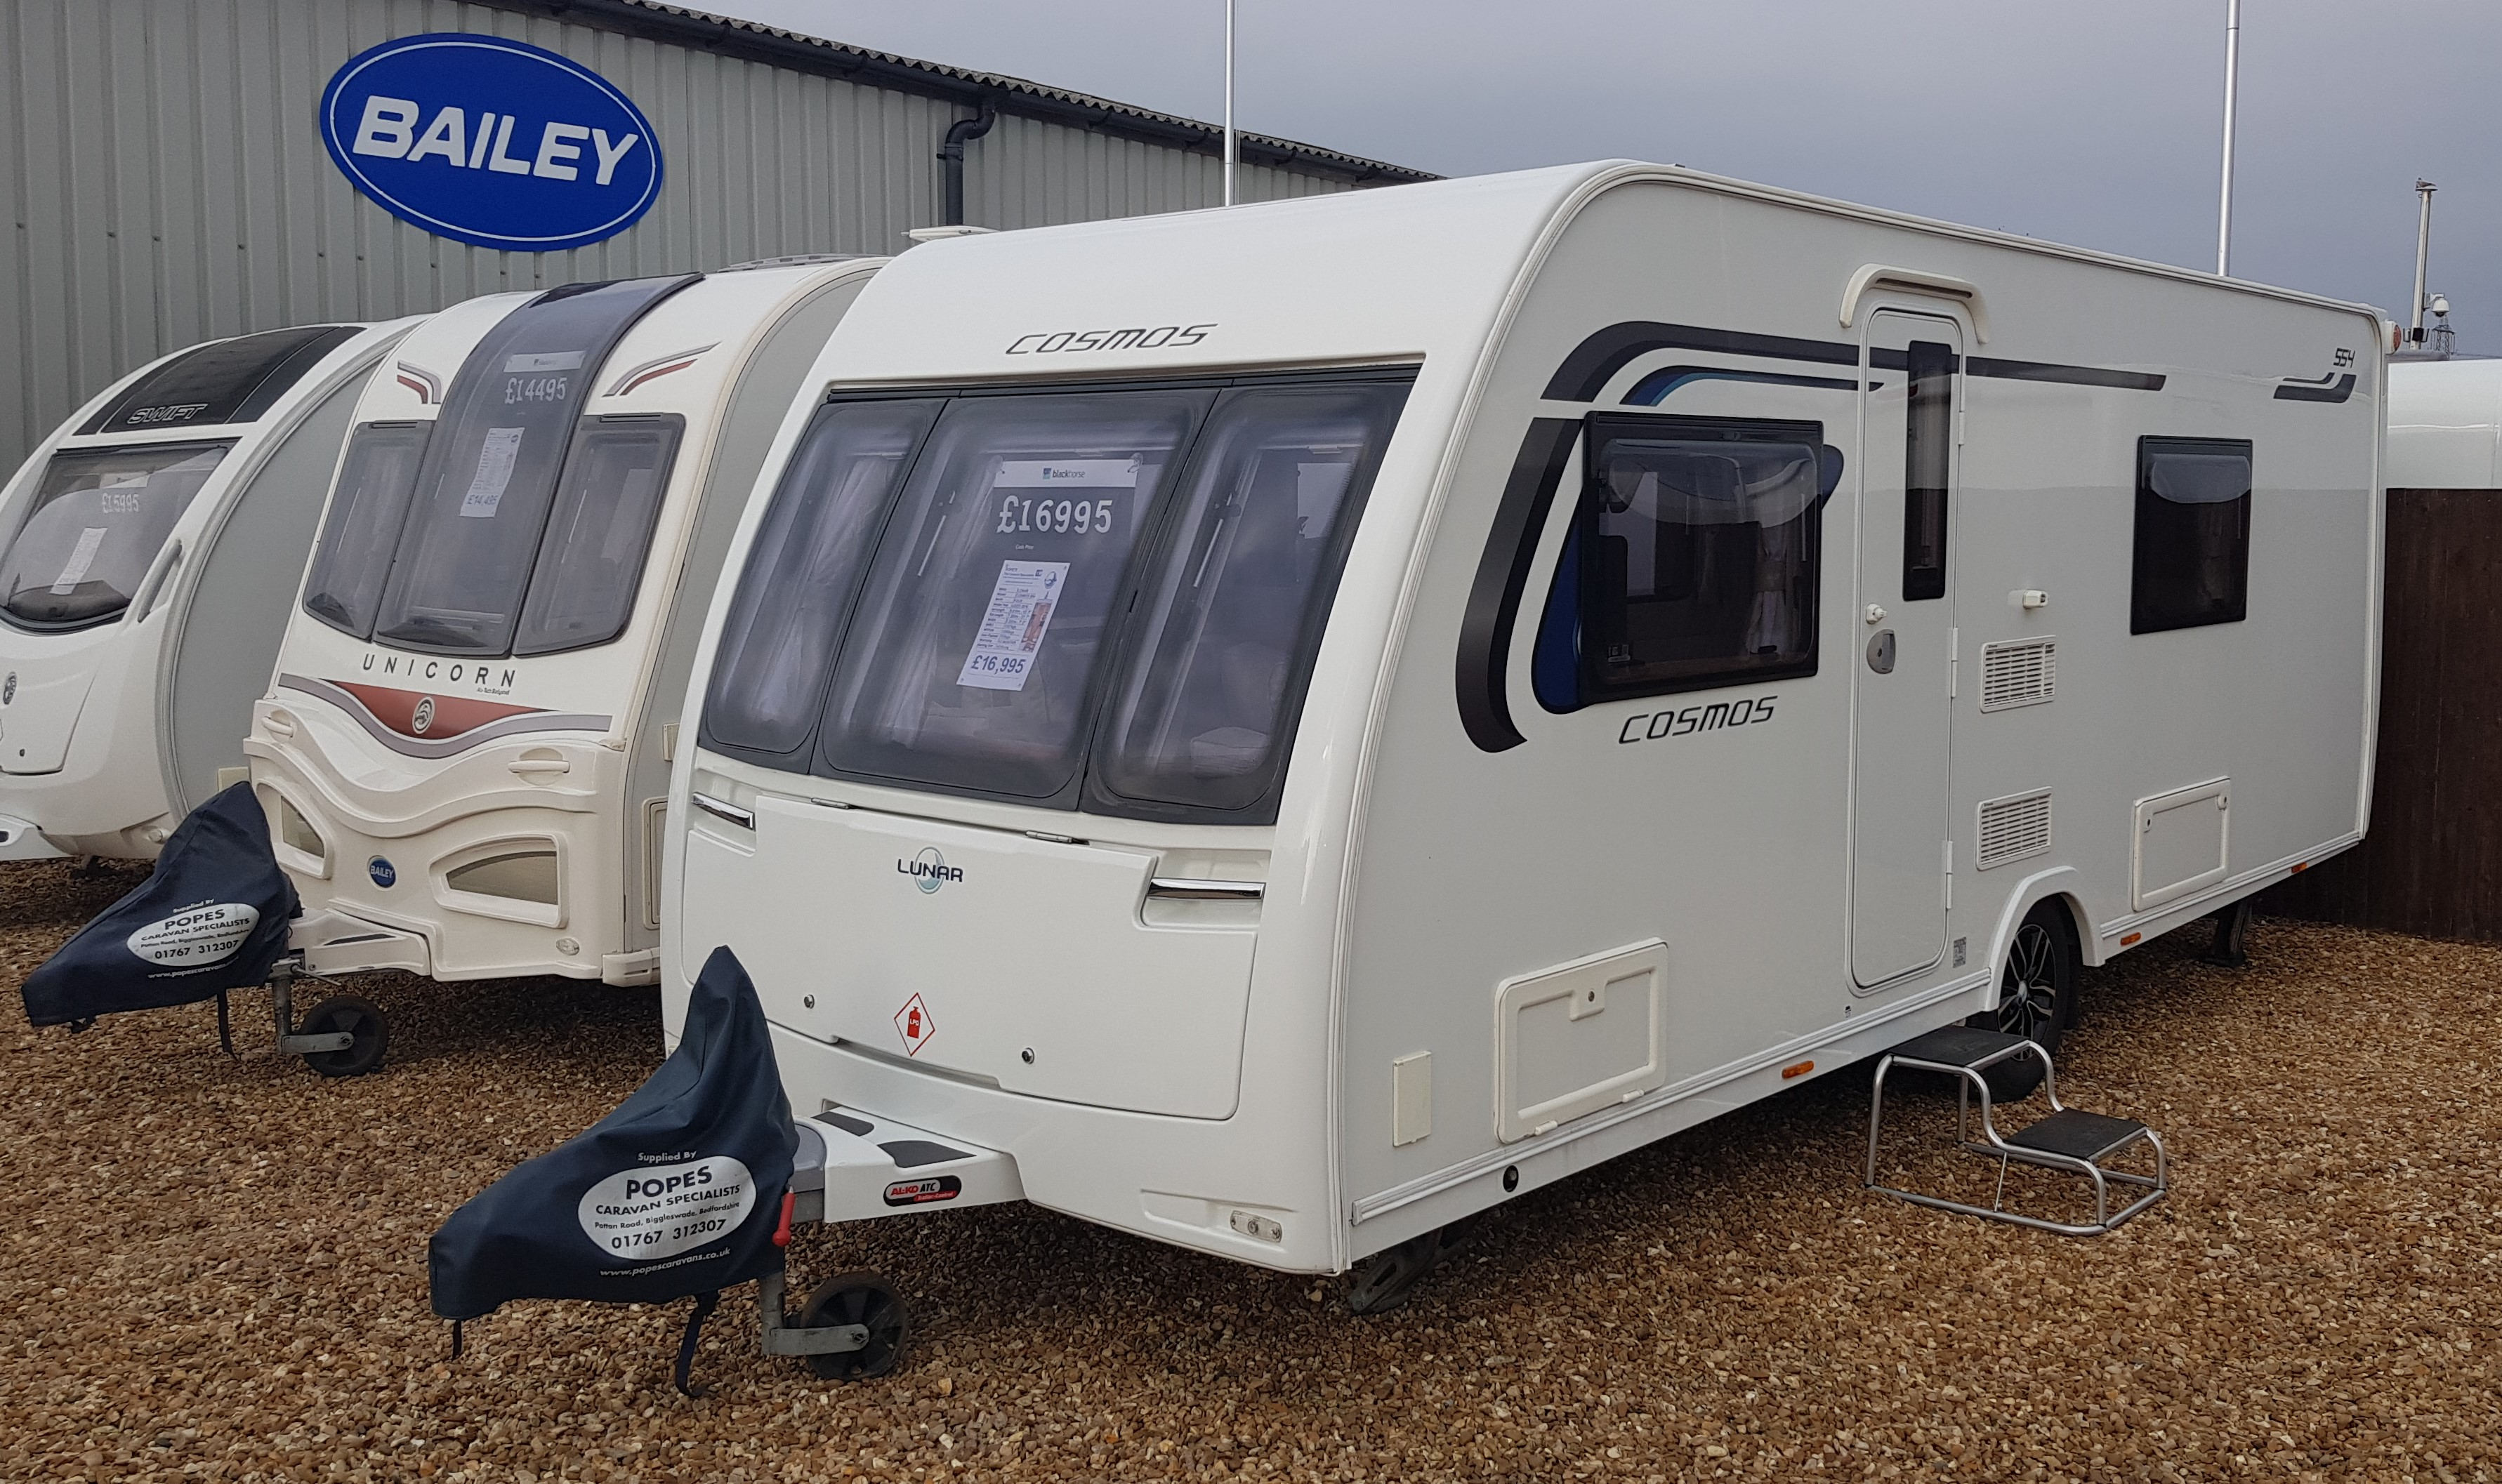 Used Caravans For Sale   Popes Caravans